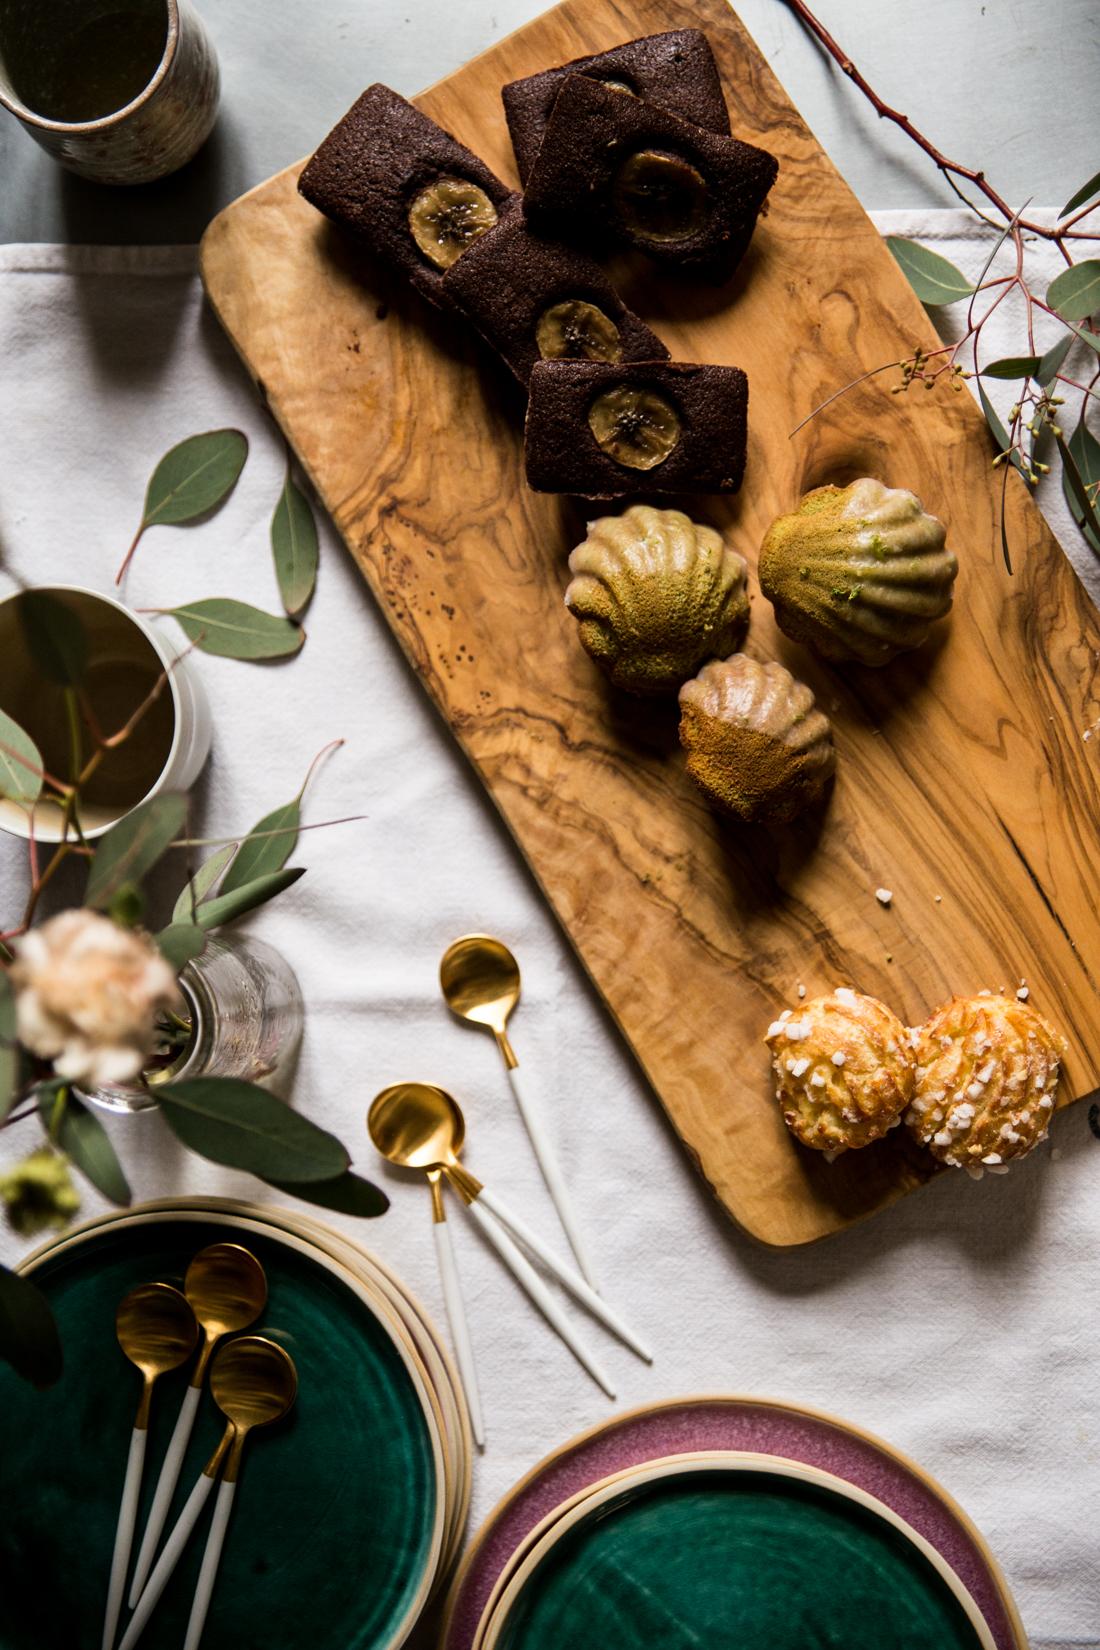 madeleines-au-the-matcha-et-glacage-au-citron-vert-ophelies-kitchen-book-2